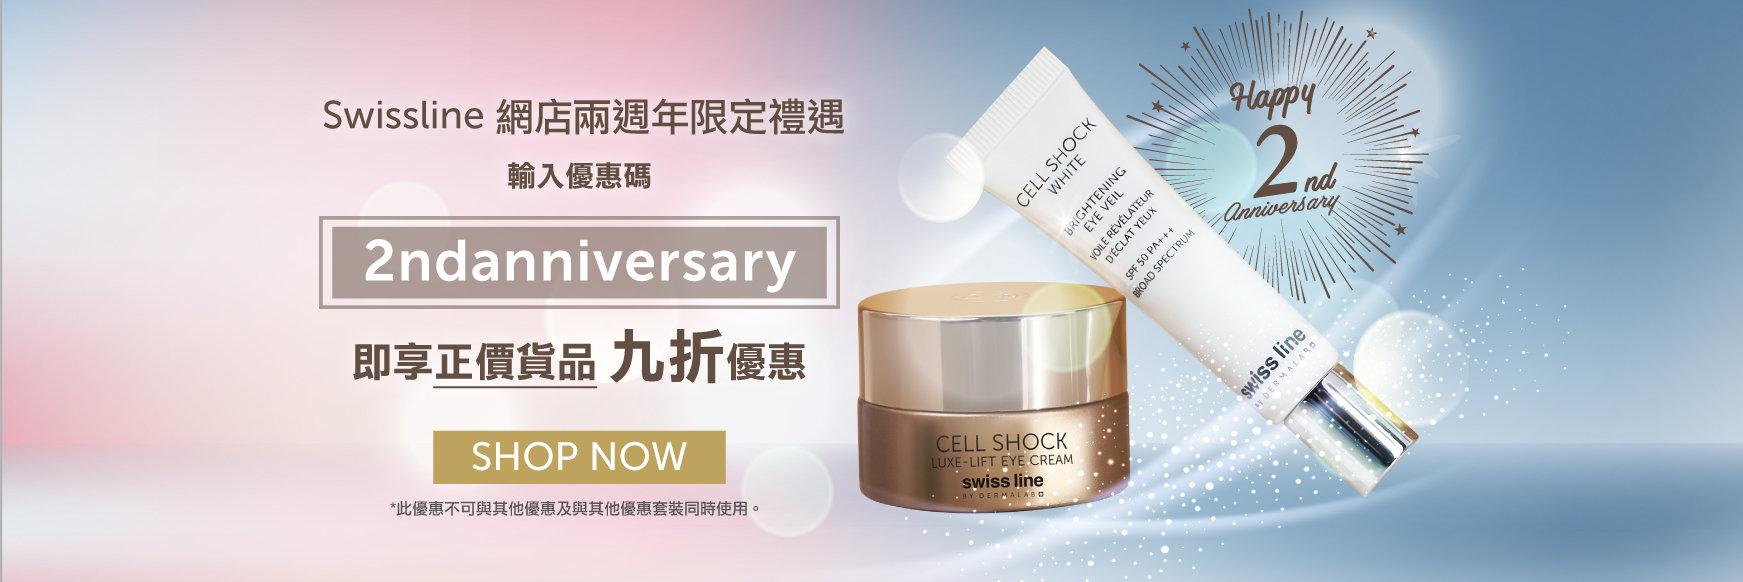 swissline September e-shop banner  30August2021_eshop 2週年promotion.jpg